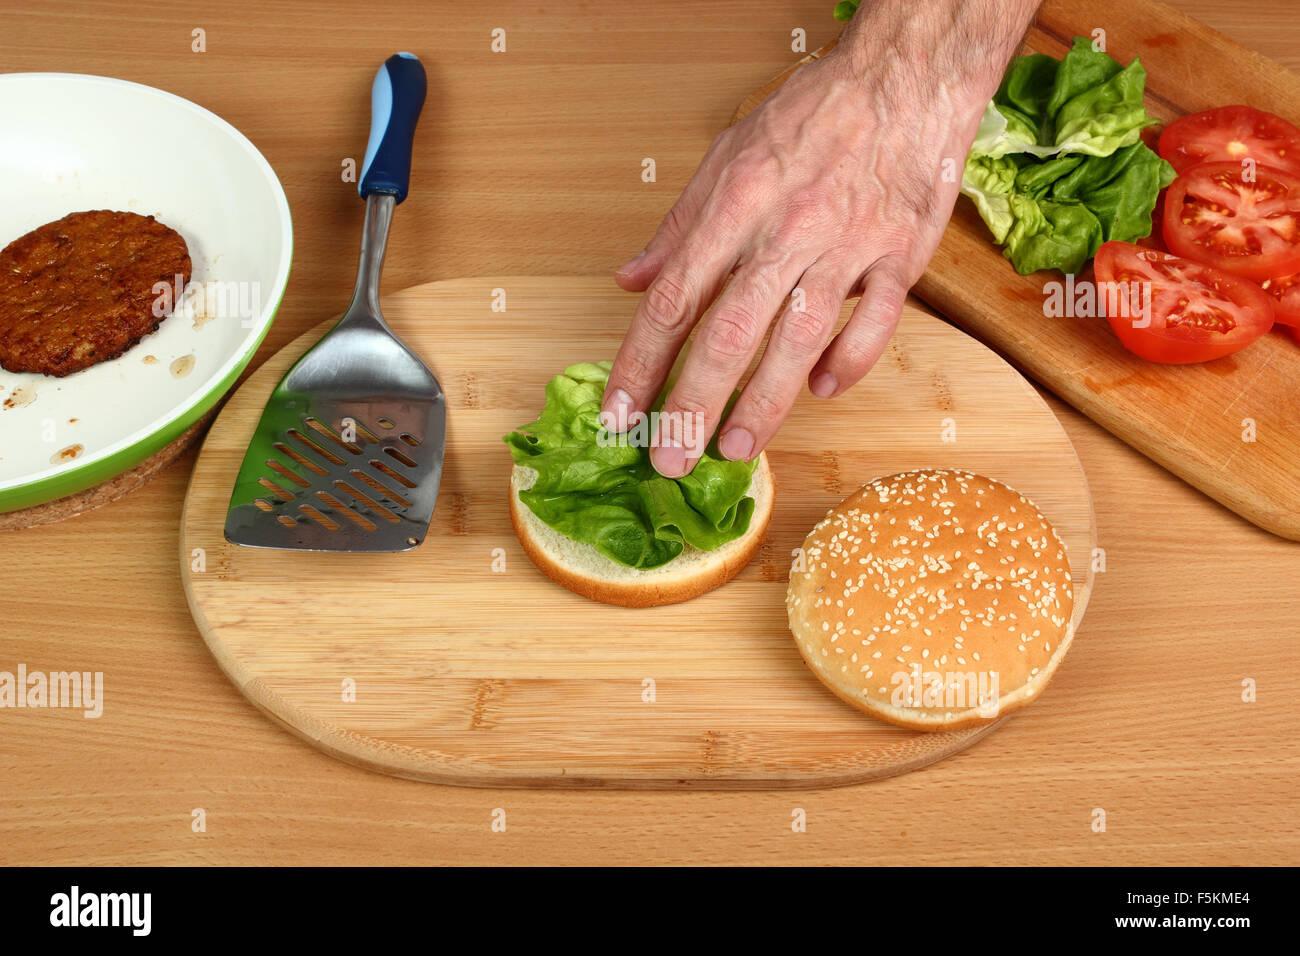 how to pan cook a hamburger